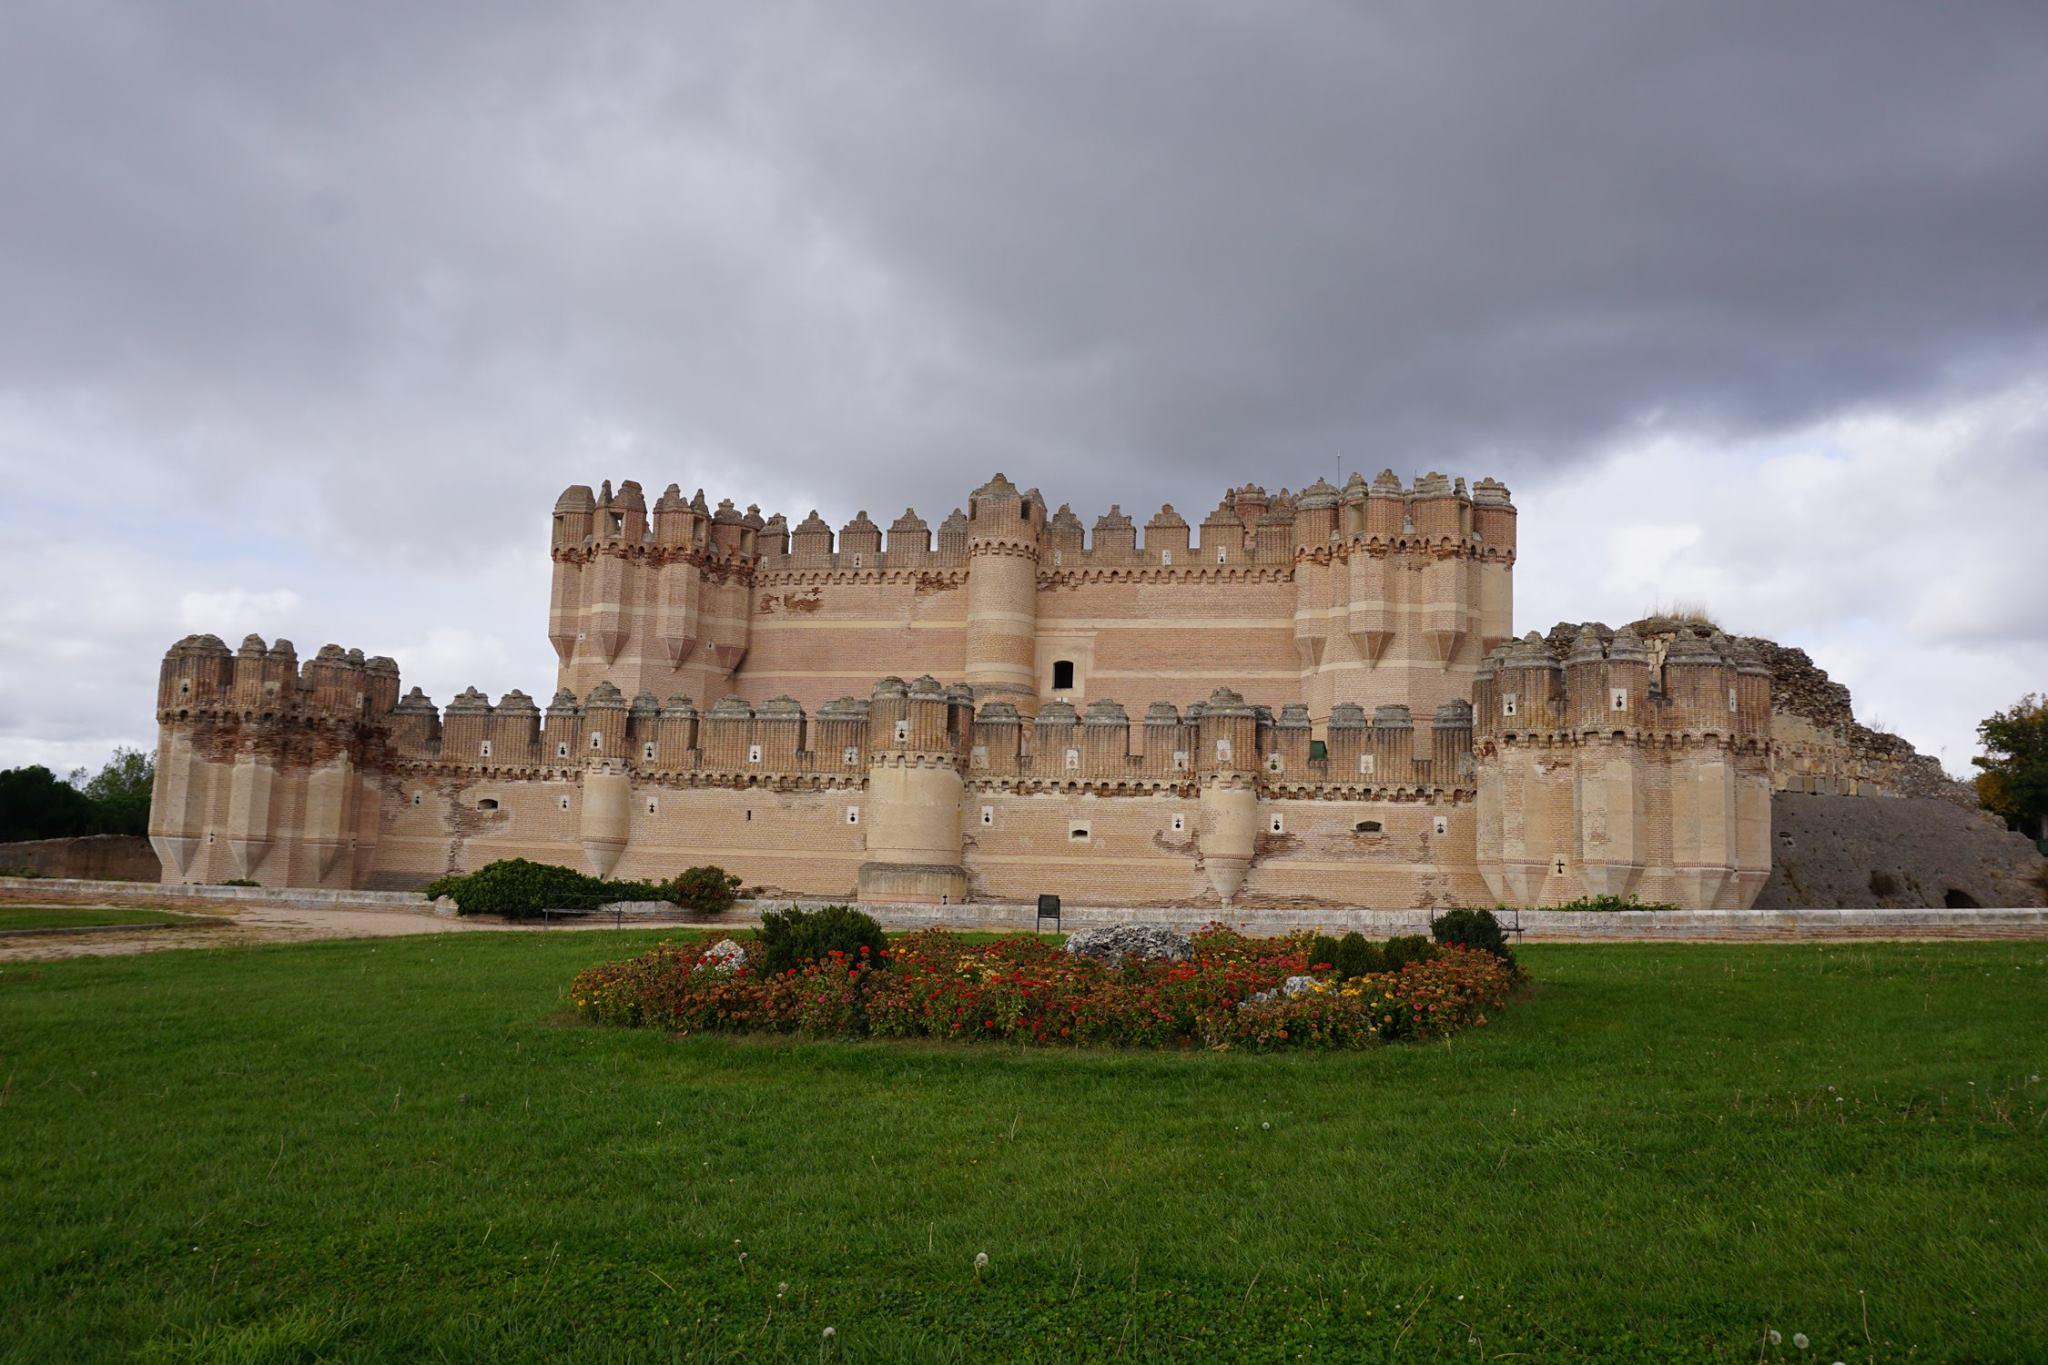 Castillo de Coca